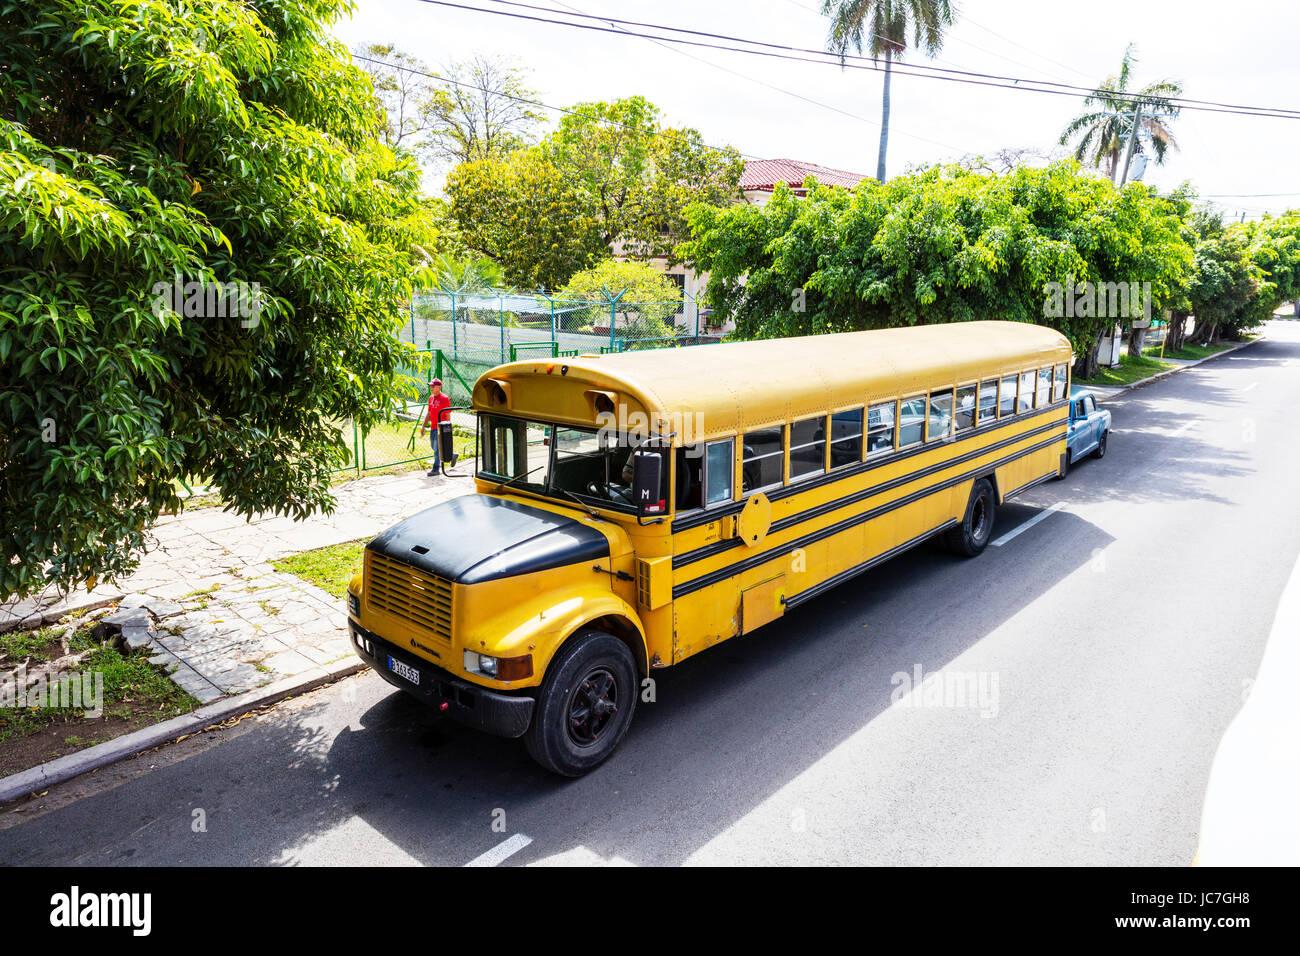 kubanische schulbus alten amerikanischen schulbus school. Black Bedroom Furniture Sets. Home Design Ideas